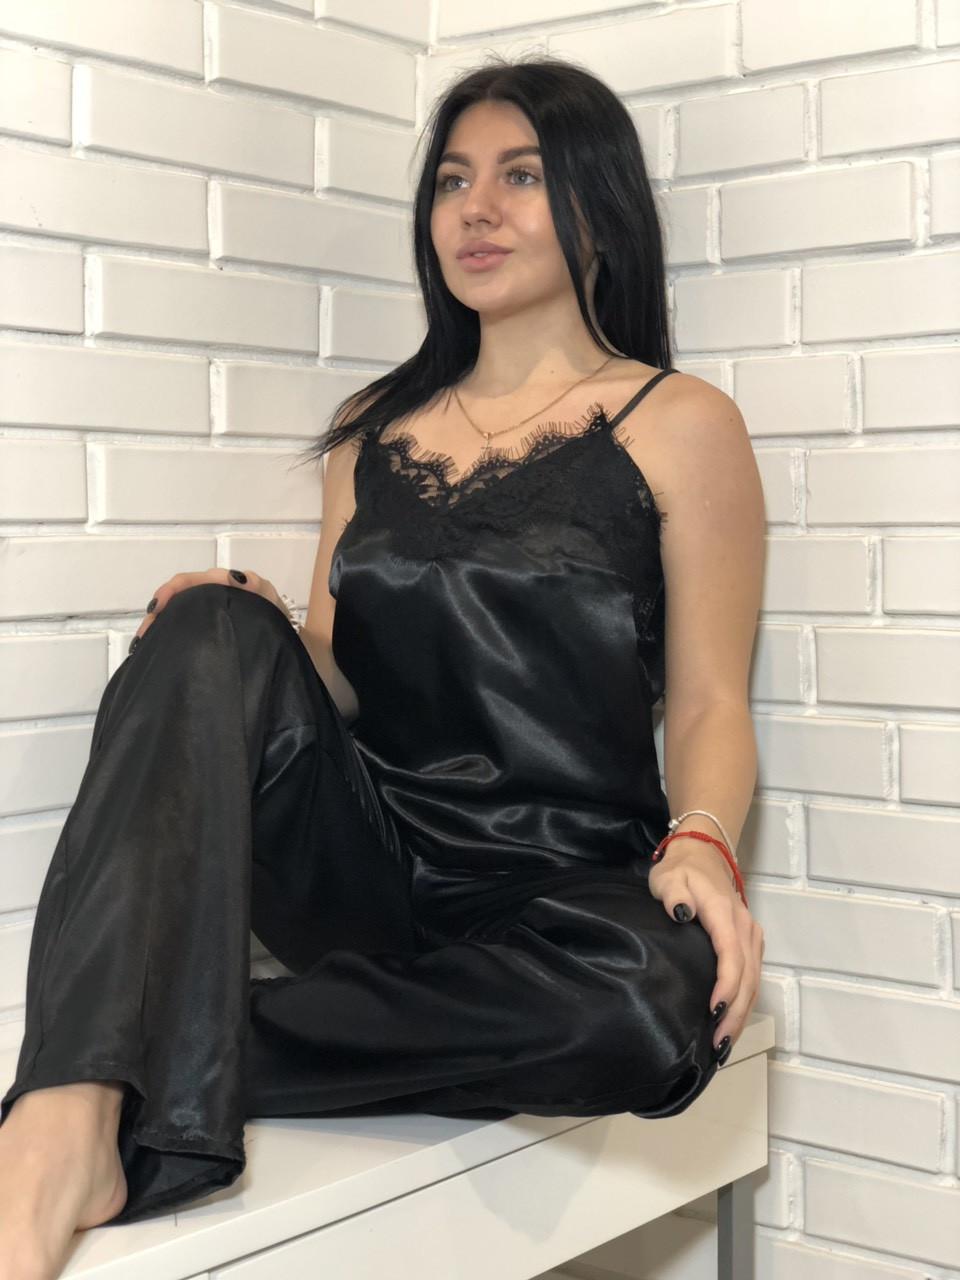 Черная атласная пижама штаны и майка, одежда ТМ Exclusive